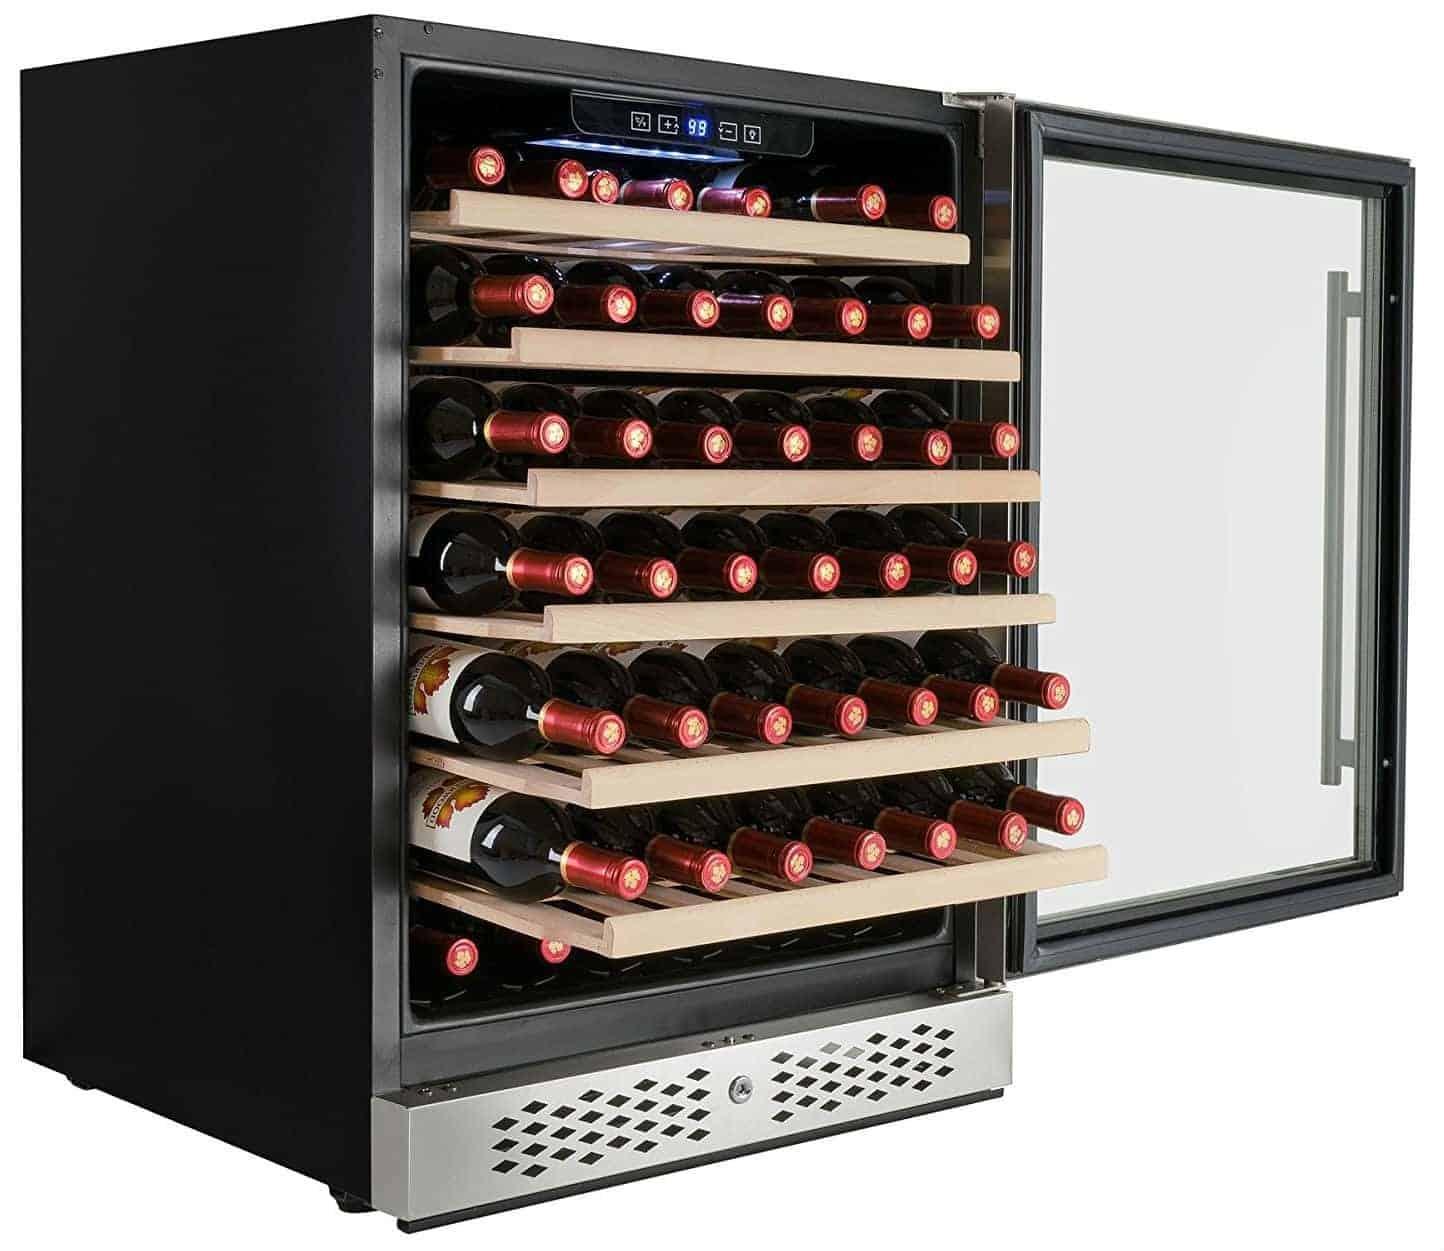 AKDY 54 Bottles Single Zone Built-in Compressor Freestanding Wine Cooler Cellar